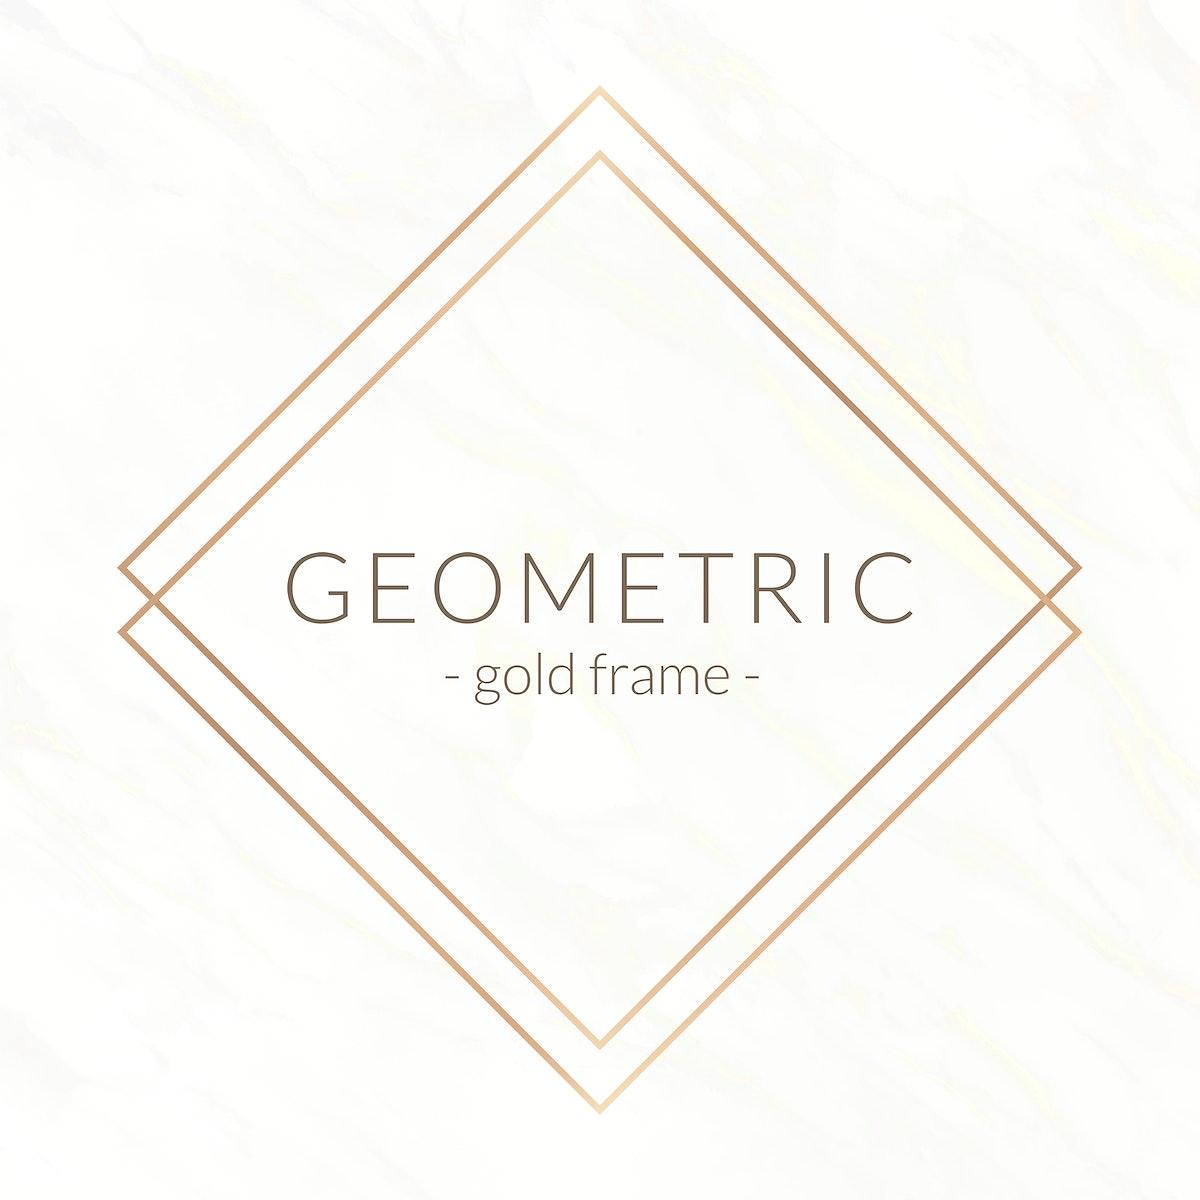 Gold rhombus frame on a white marble background illustration